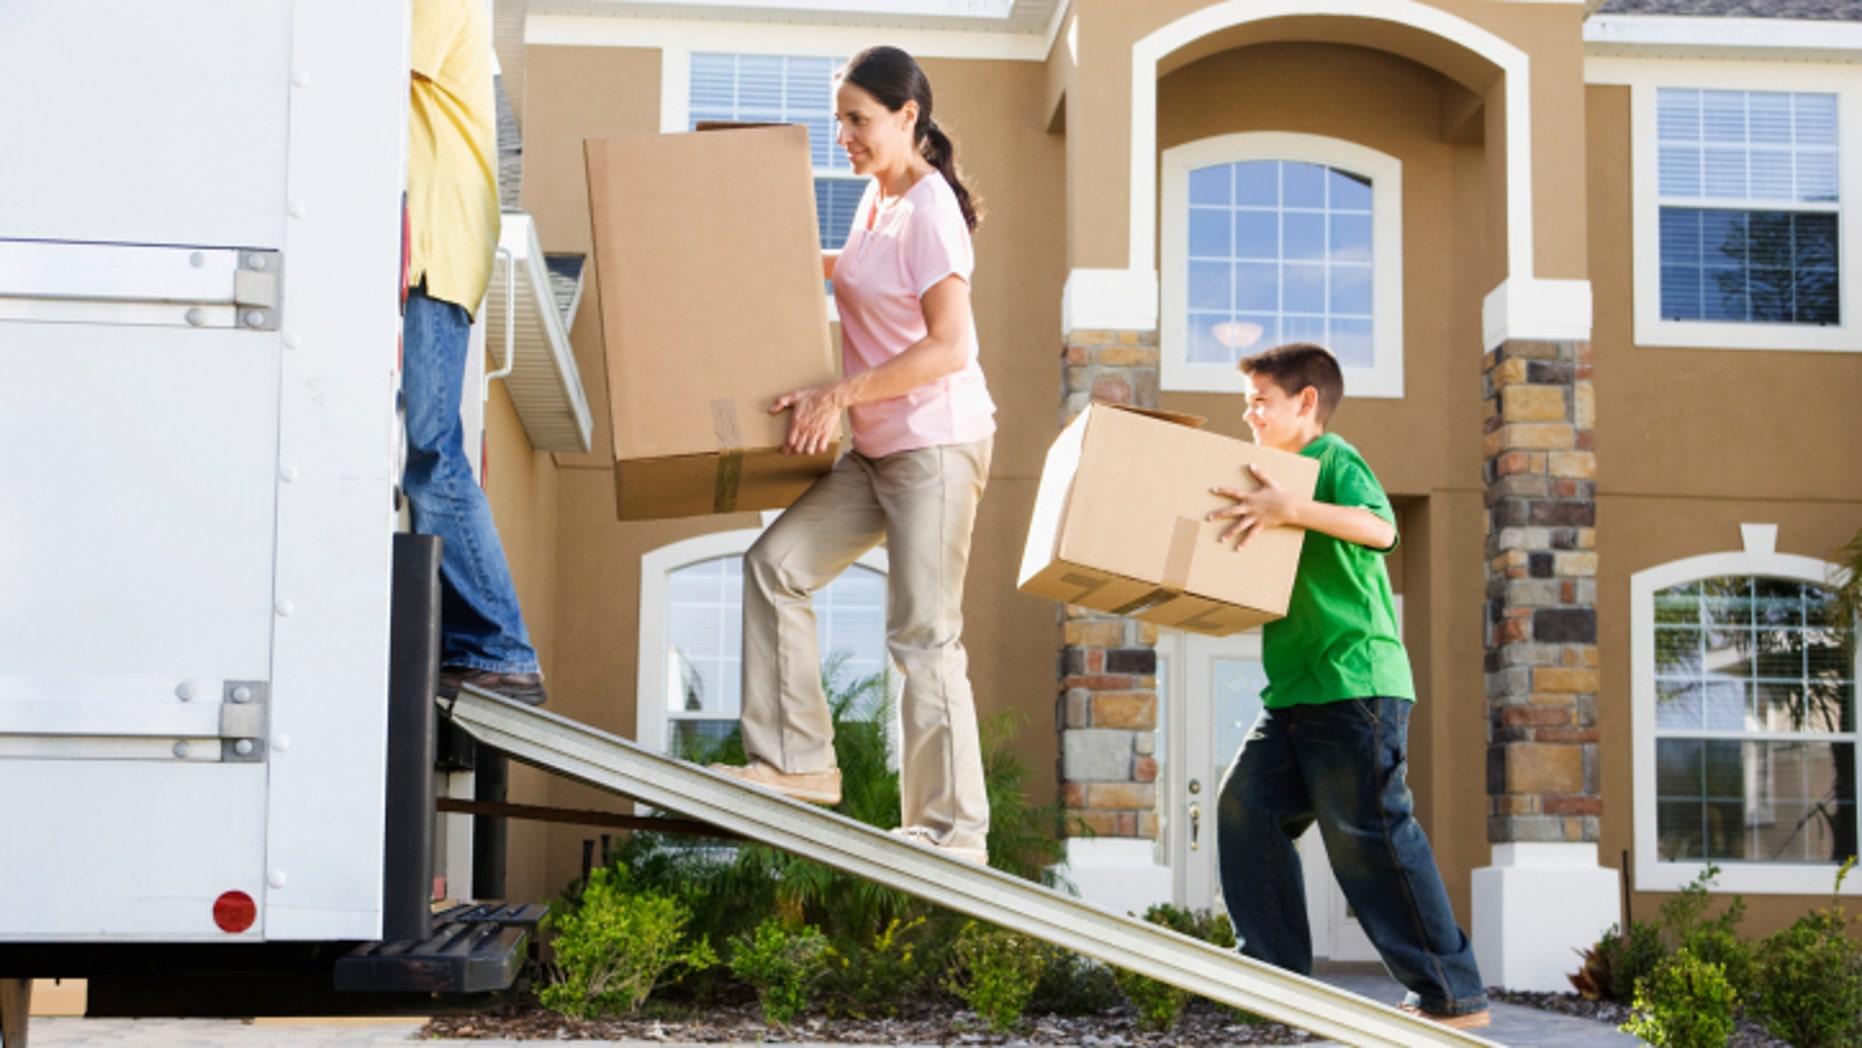 Family Loading Moving Truck